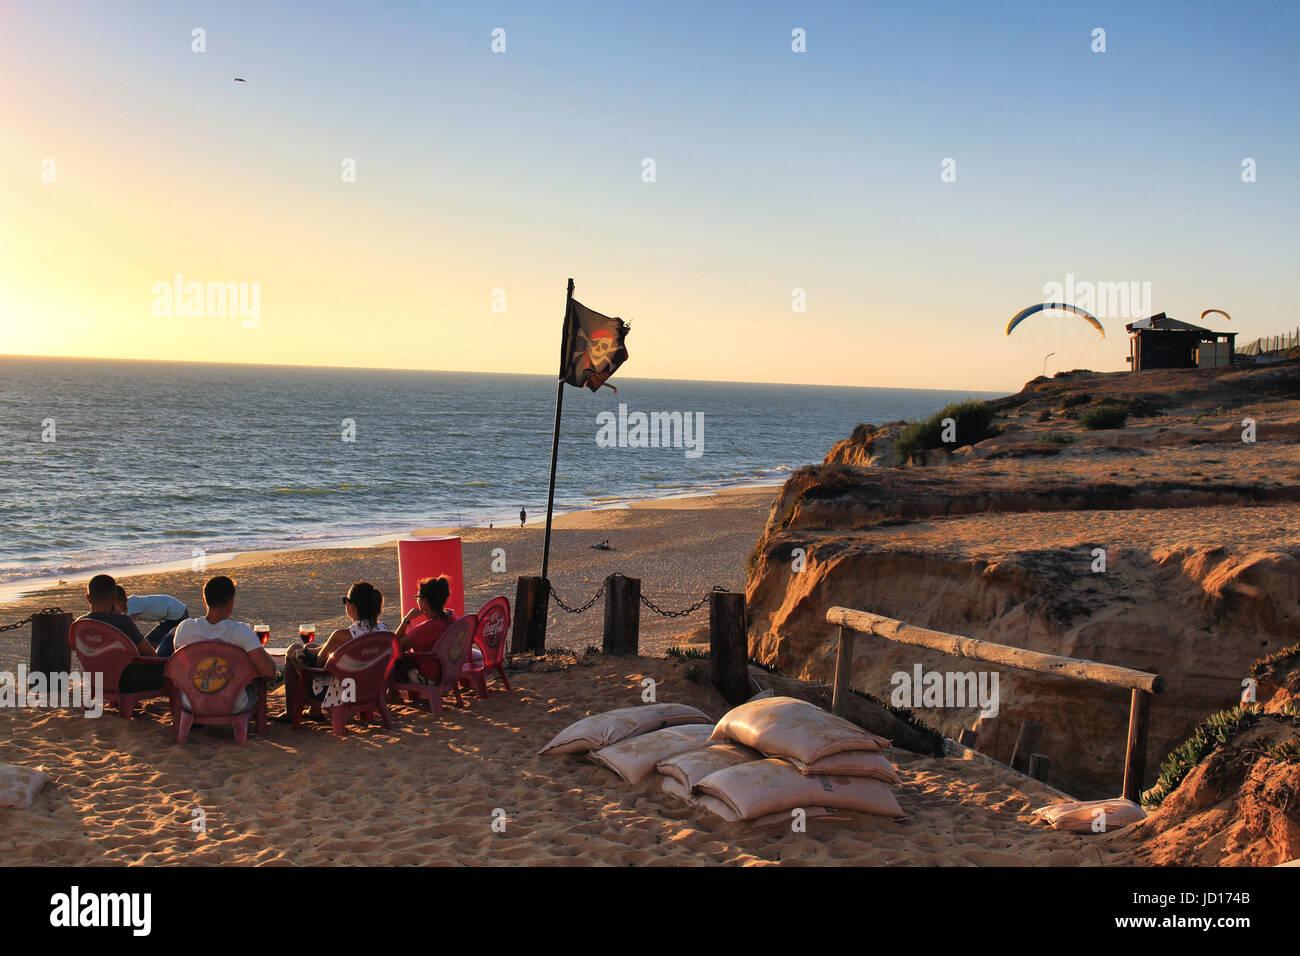 CADIZ/SPAIN - CIRCA OCTOBER 2016: People enjoying the sunset over the Atlantic ocean in a beach bar in Matalascañas - Stock Image